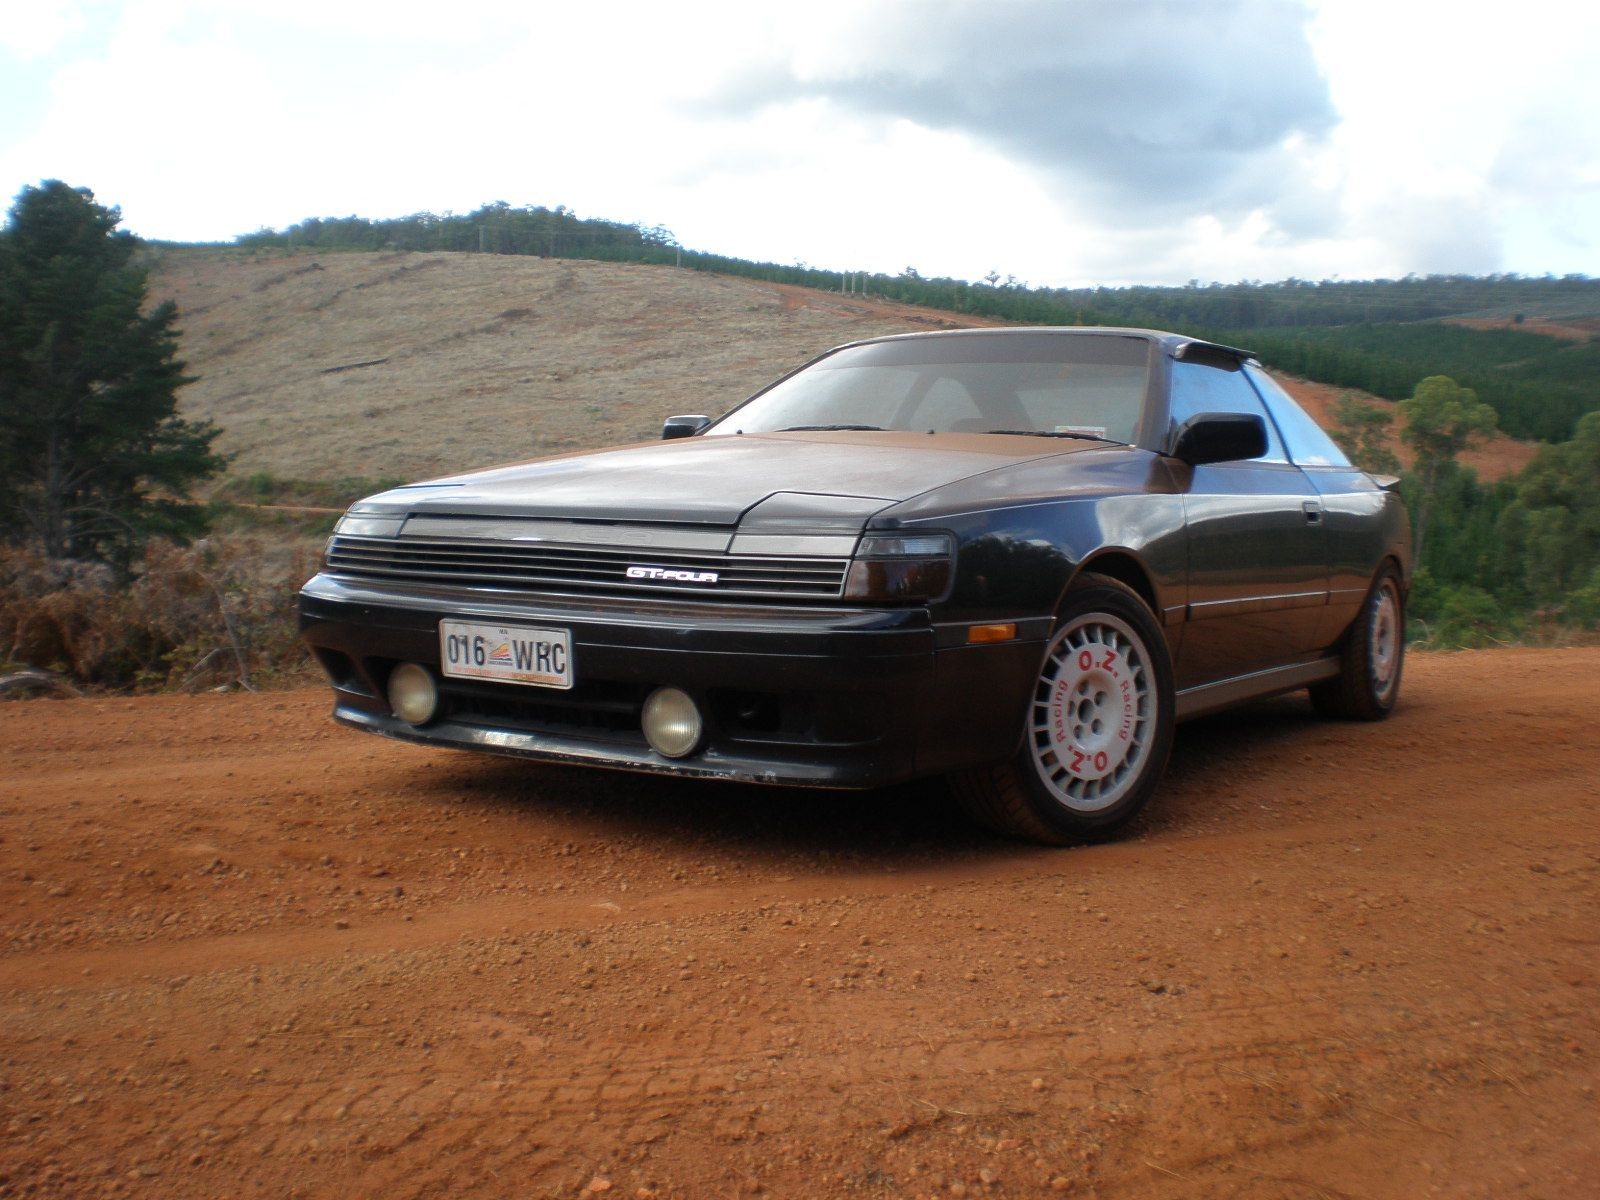 19851989 Toyota Celica GTFour/Alltrac Turbo Techno